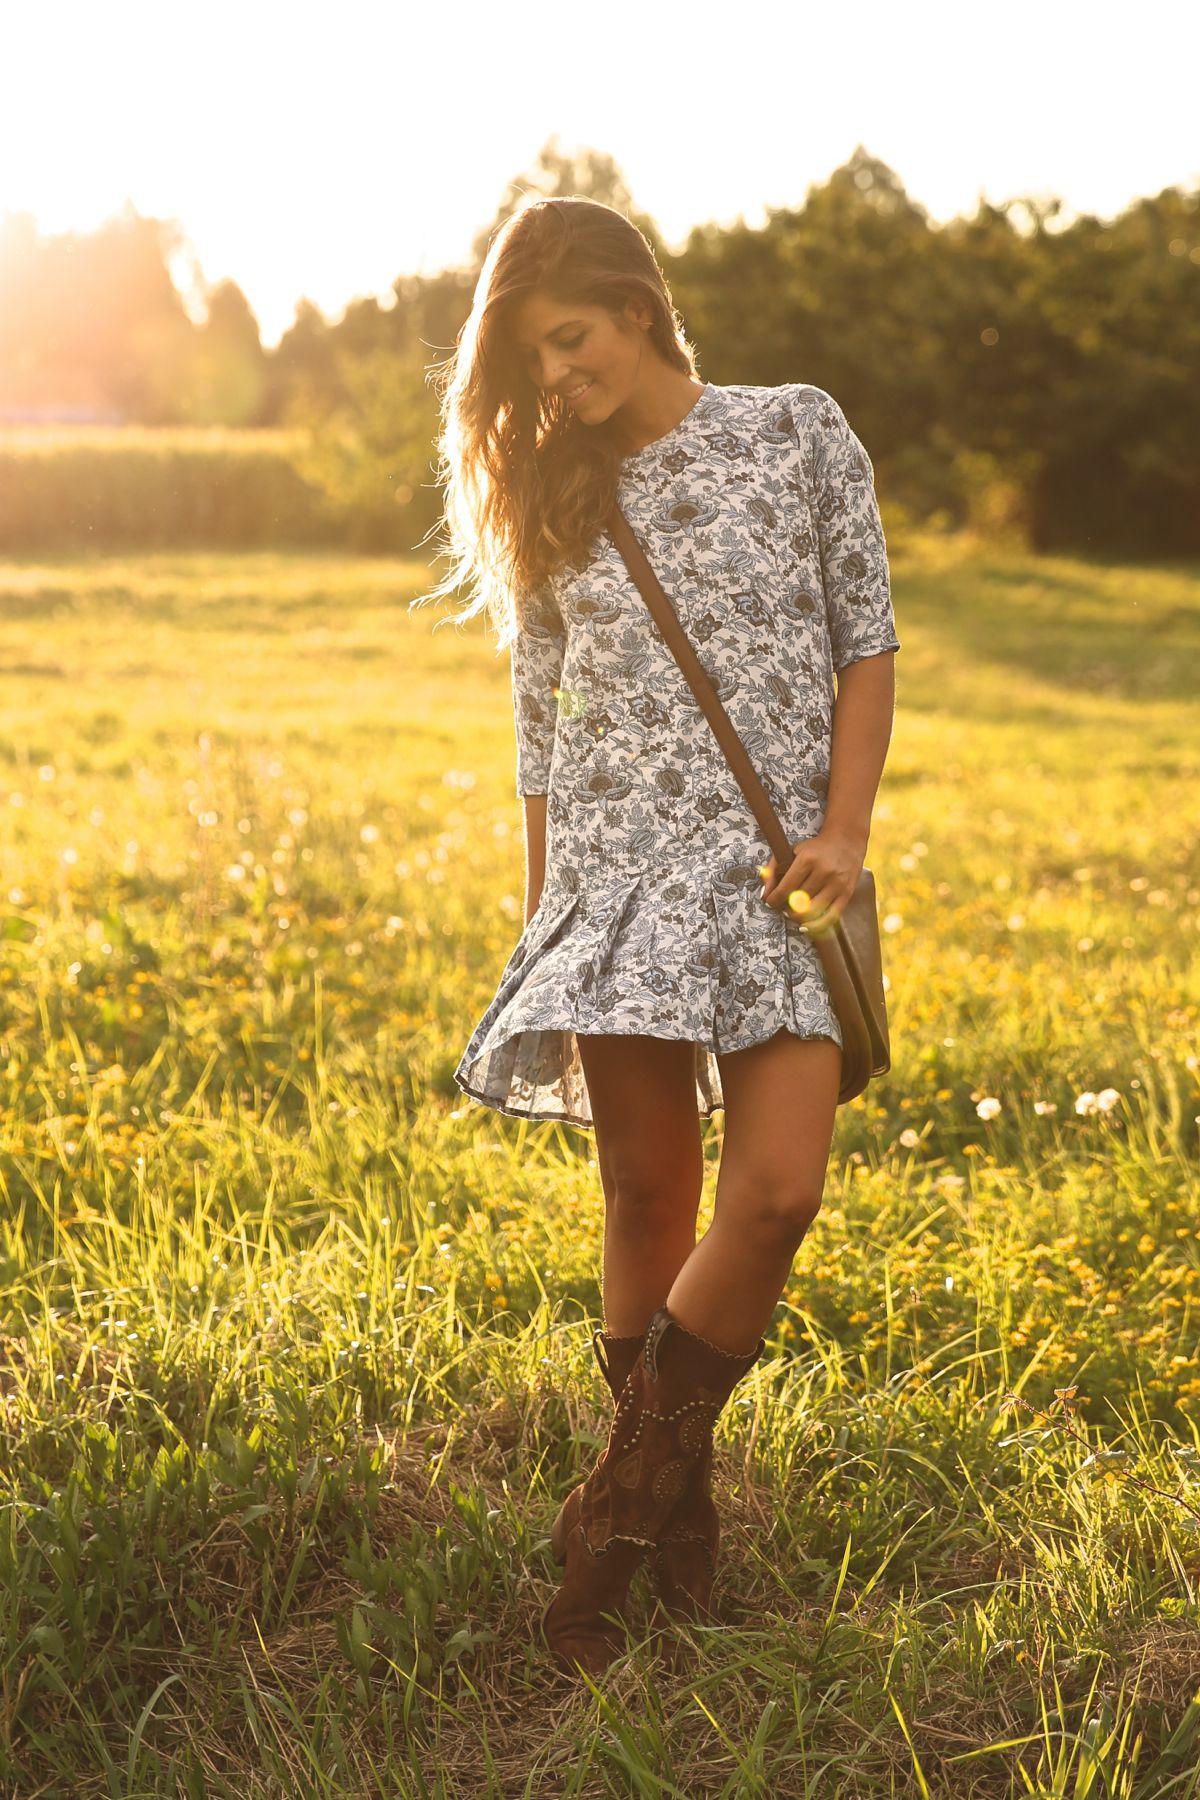 trendy_taste-look-outfit-street_style-ootd-blog-blogger-fashion_spain-moda_españa-cowboy-campero-sendra-cowboy_boots-botas_camperas-loewe-bag-bolso-vestido_flores-flower_print-dress-5